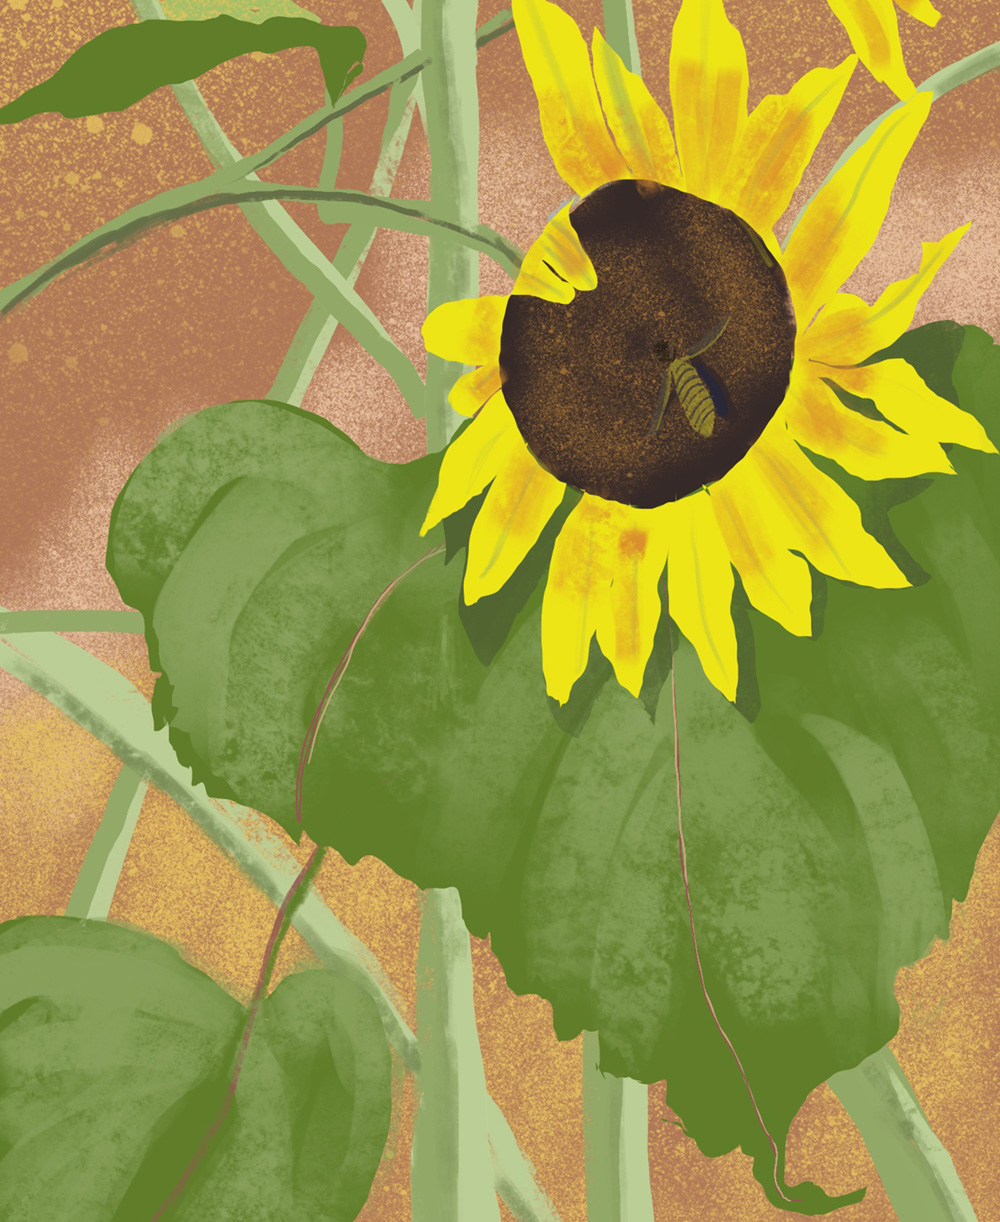 2020_0708 sunflower 1000